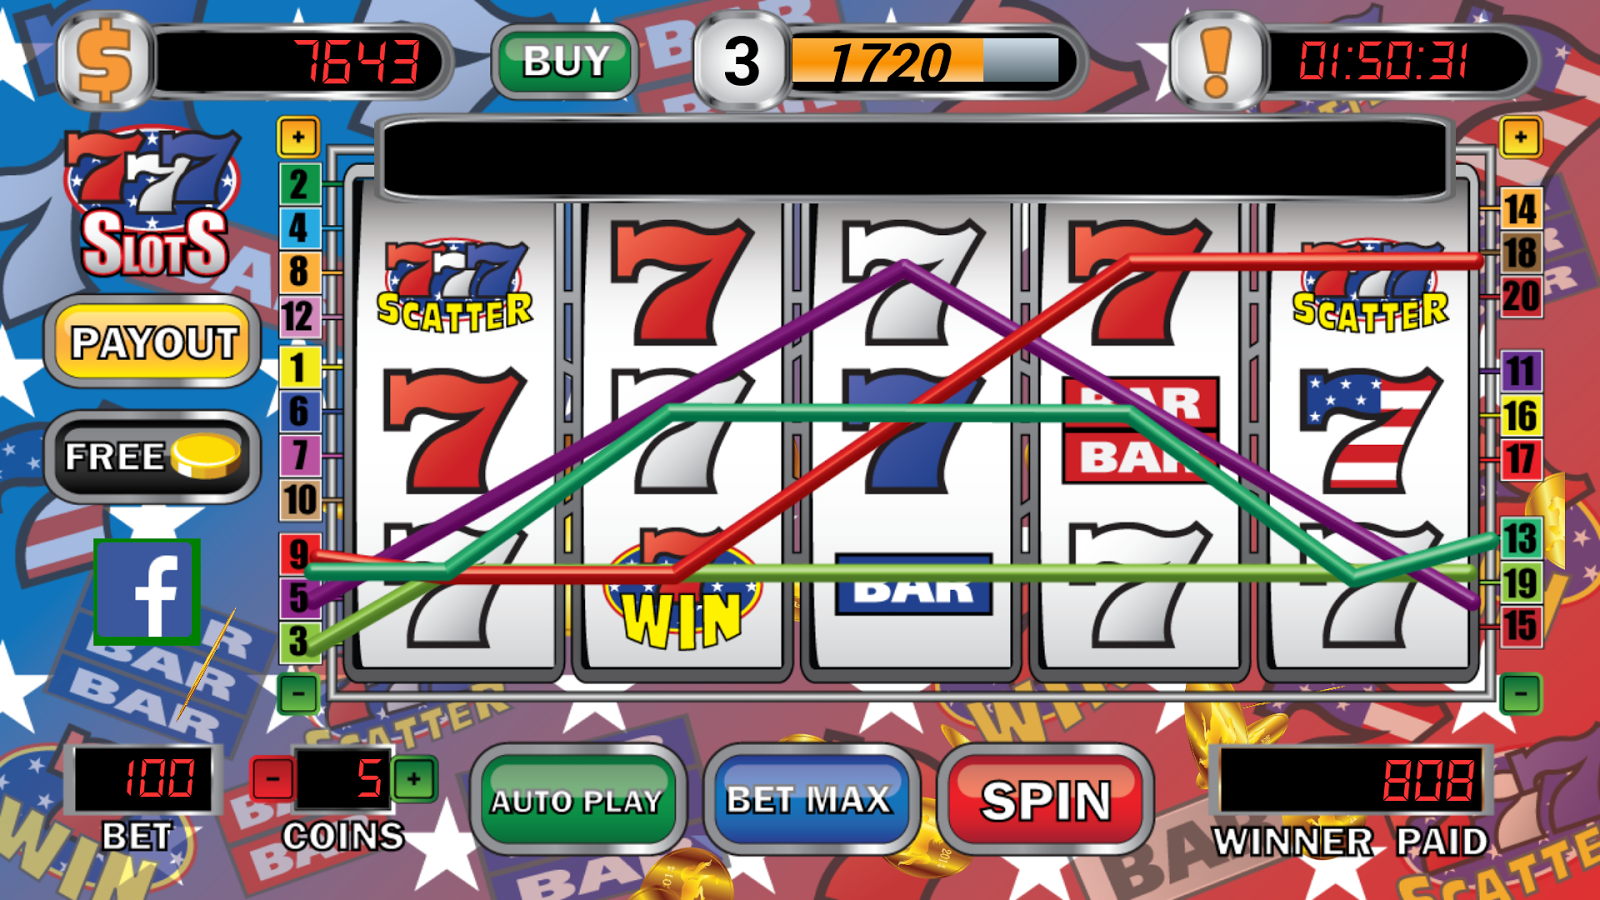 WMG Slot Machines - Play Free WMG Slot Games Online